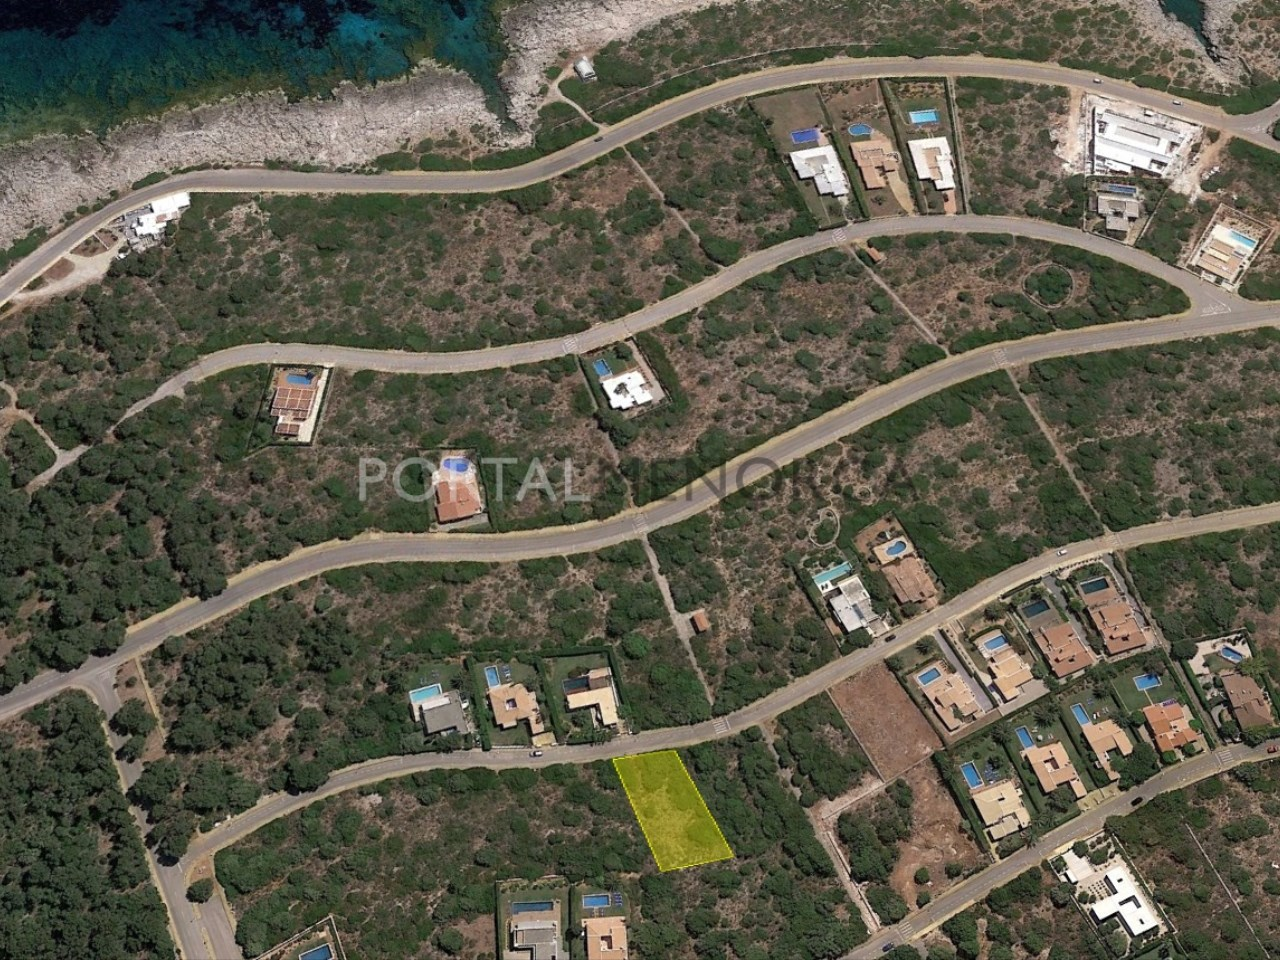 Parcela edificable cerca del mar en venta en Torret de Baix